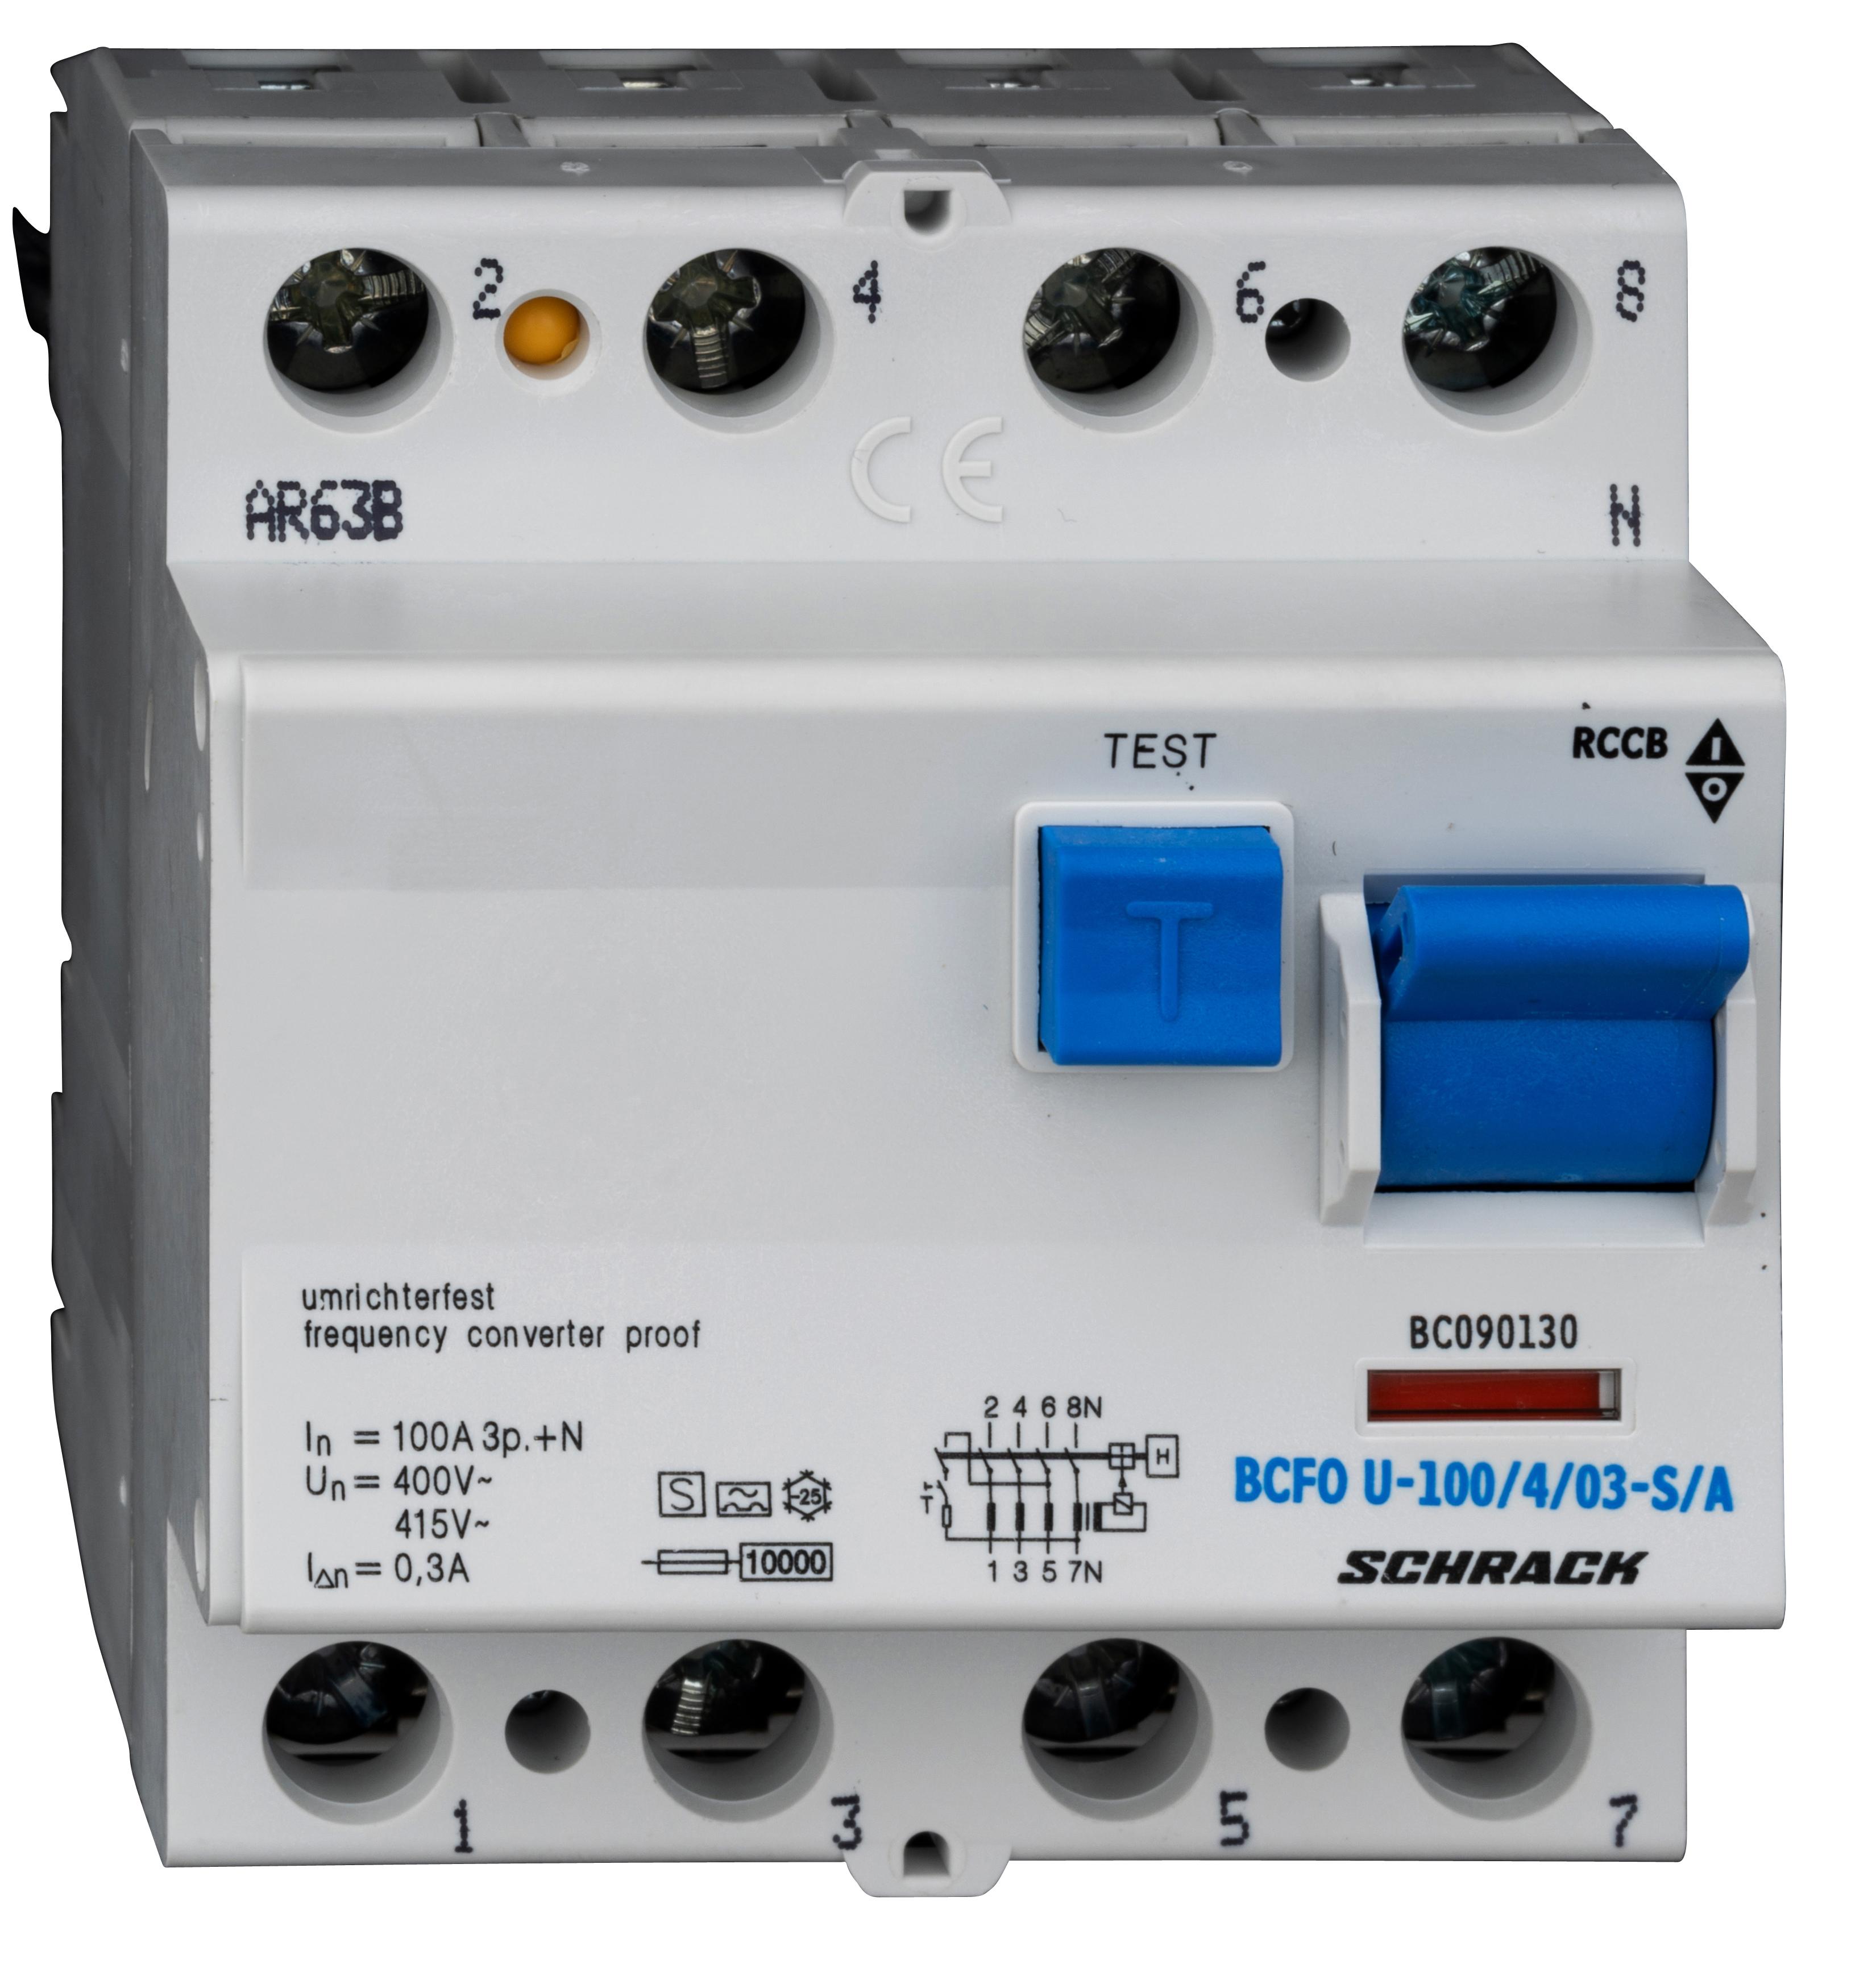 1 Stk FI-Schalter, FU fest, 100A, 4-polig, 300mA, Bauart S, Typ A BC090130--